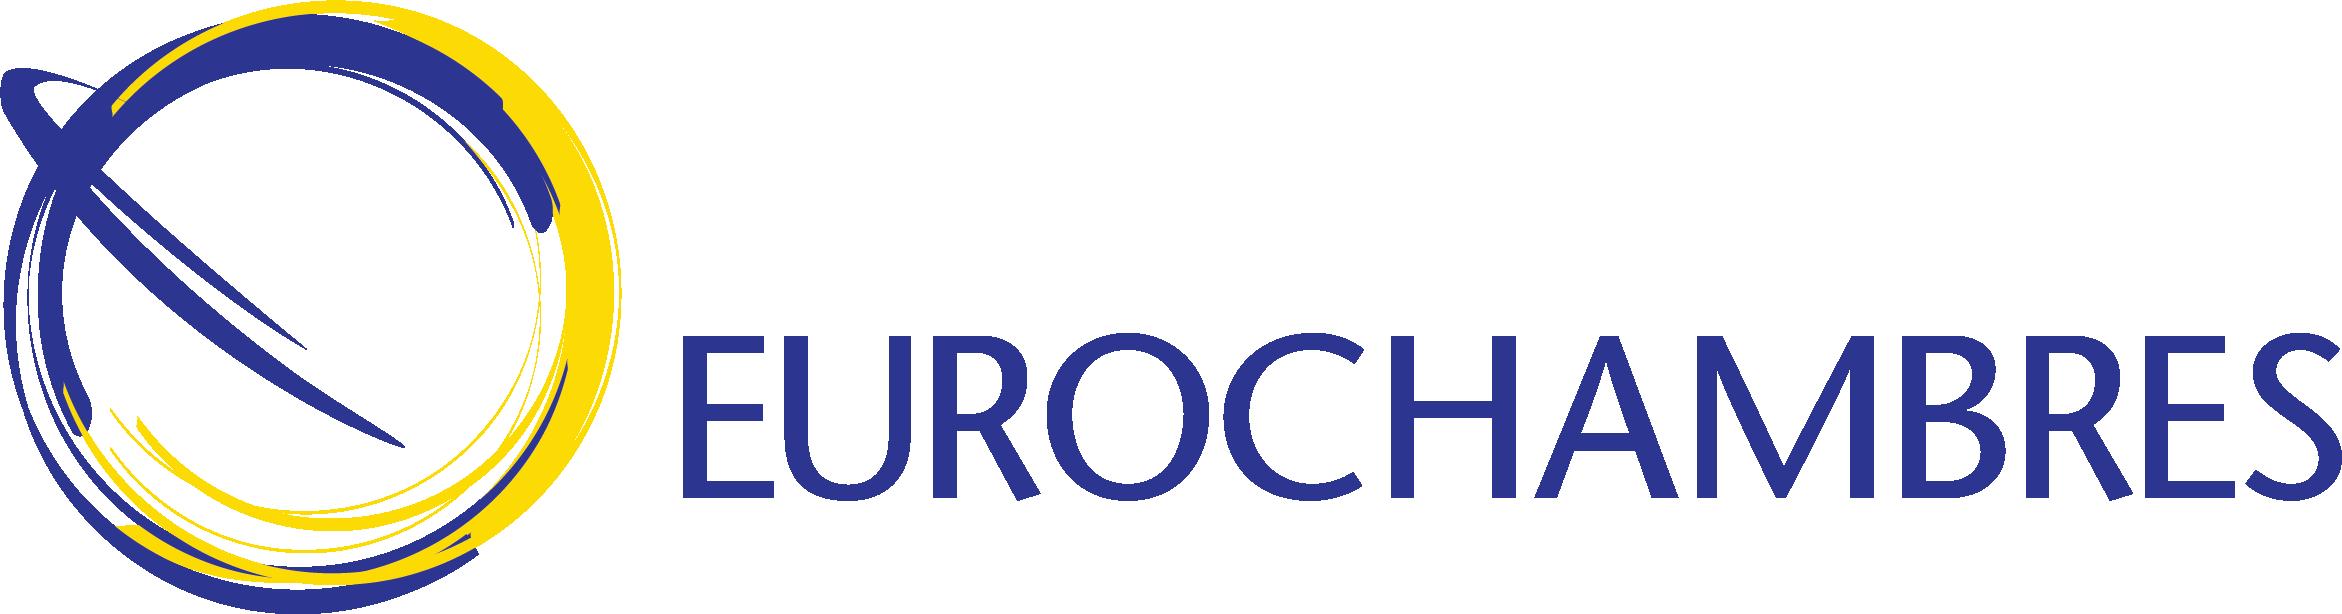 EUROCHAMBRES | COVID-19 Platform